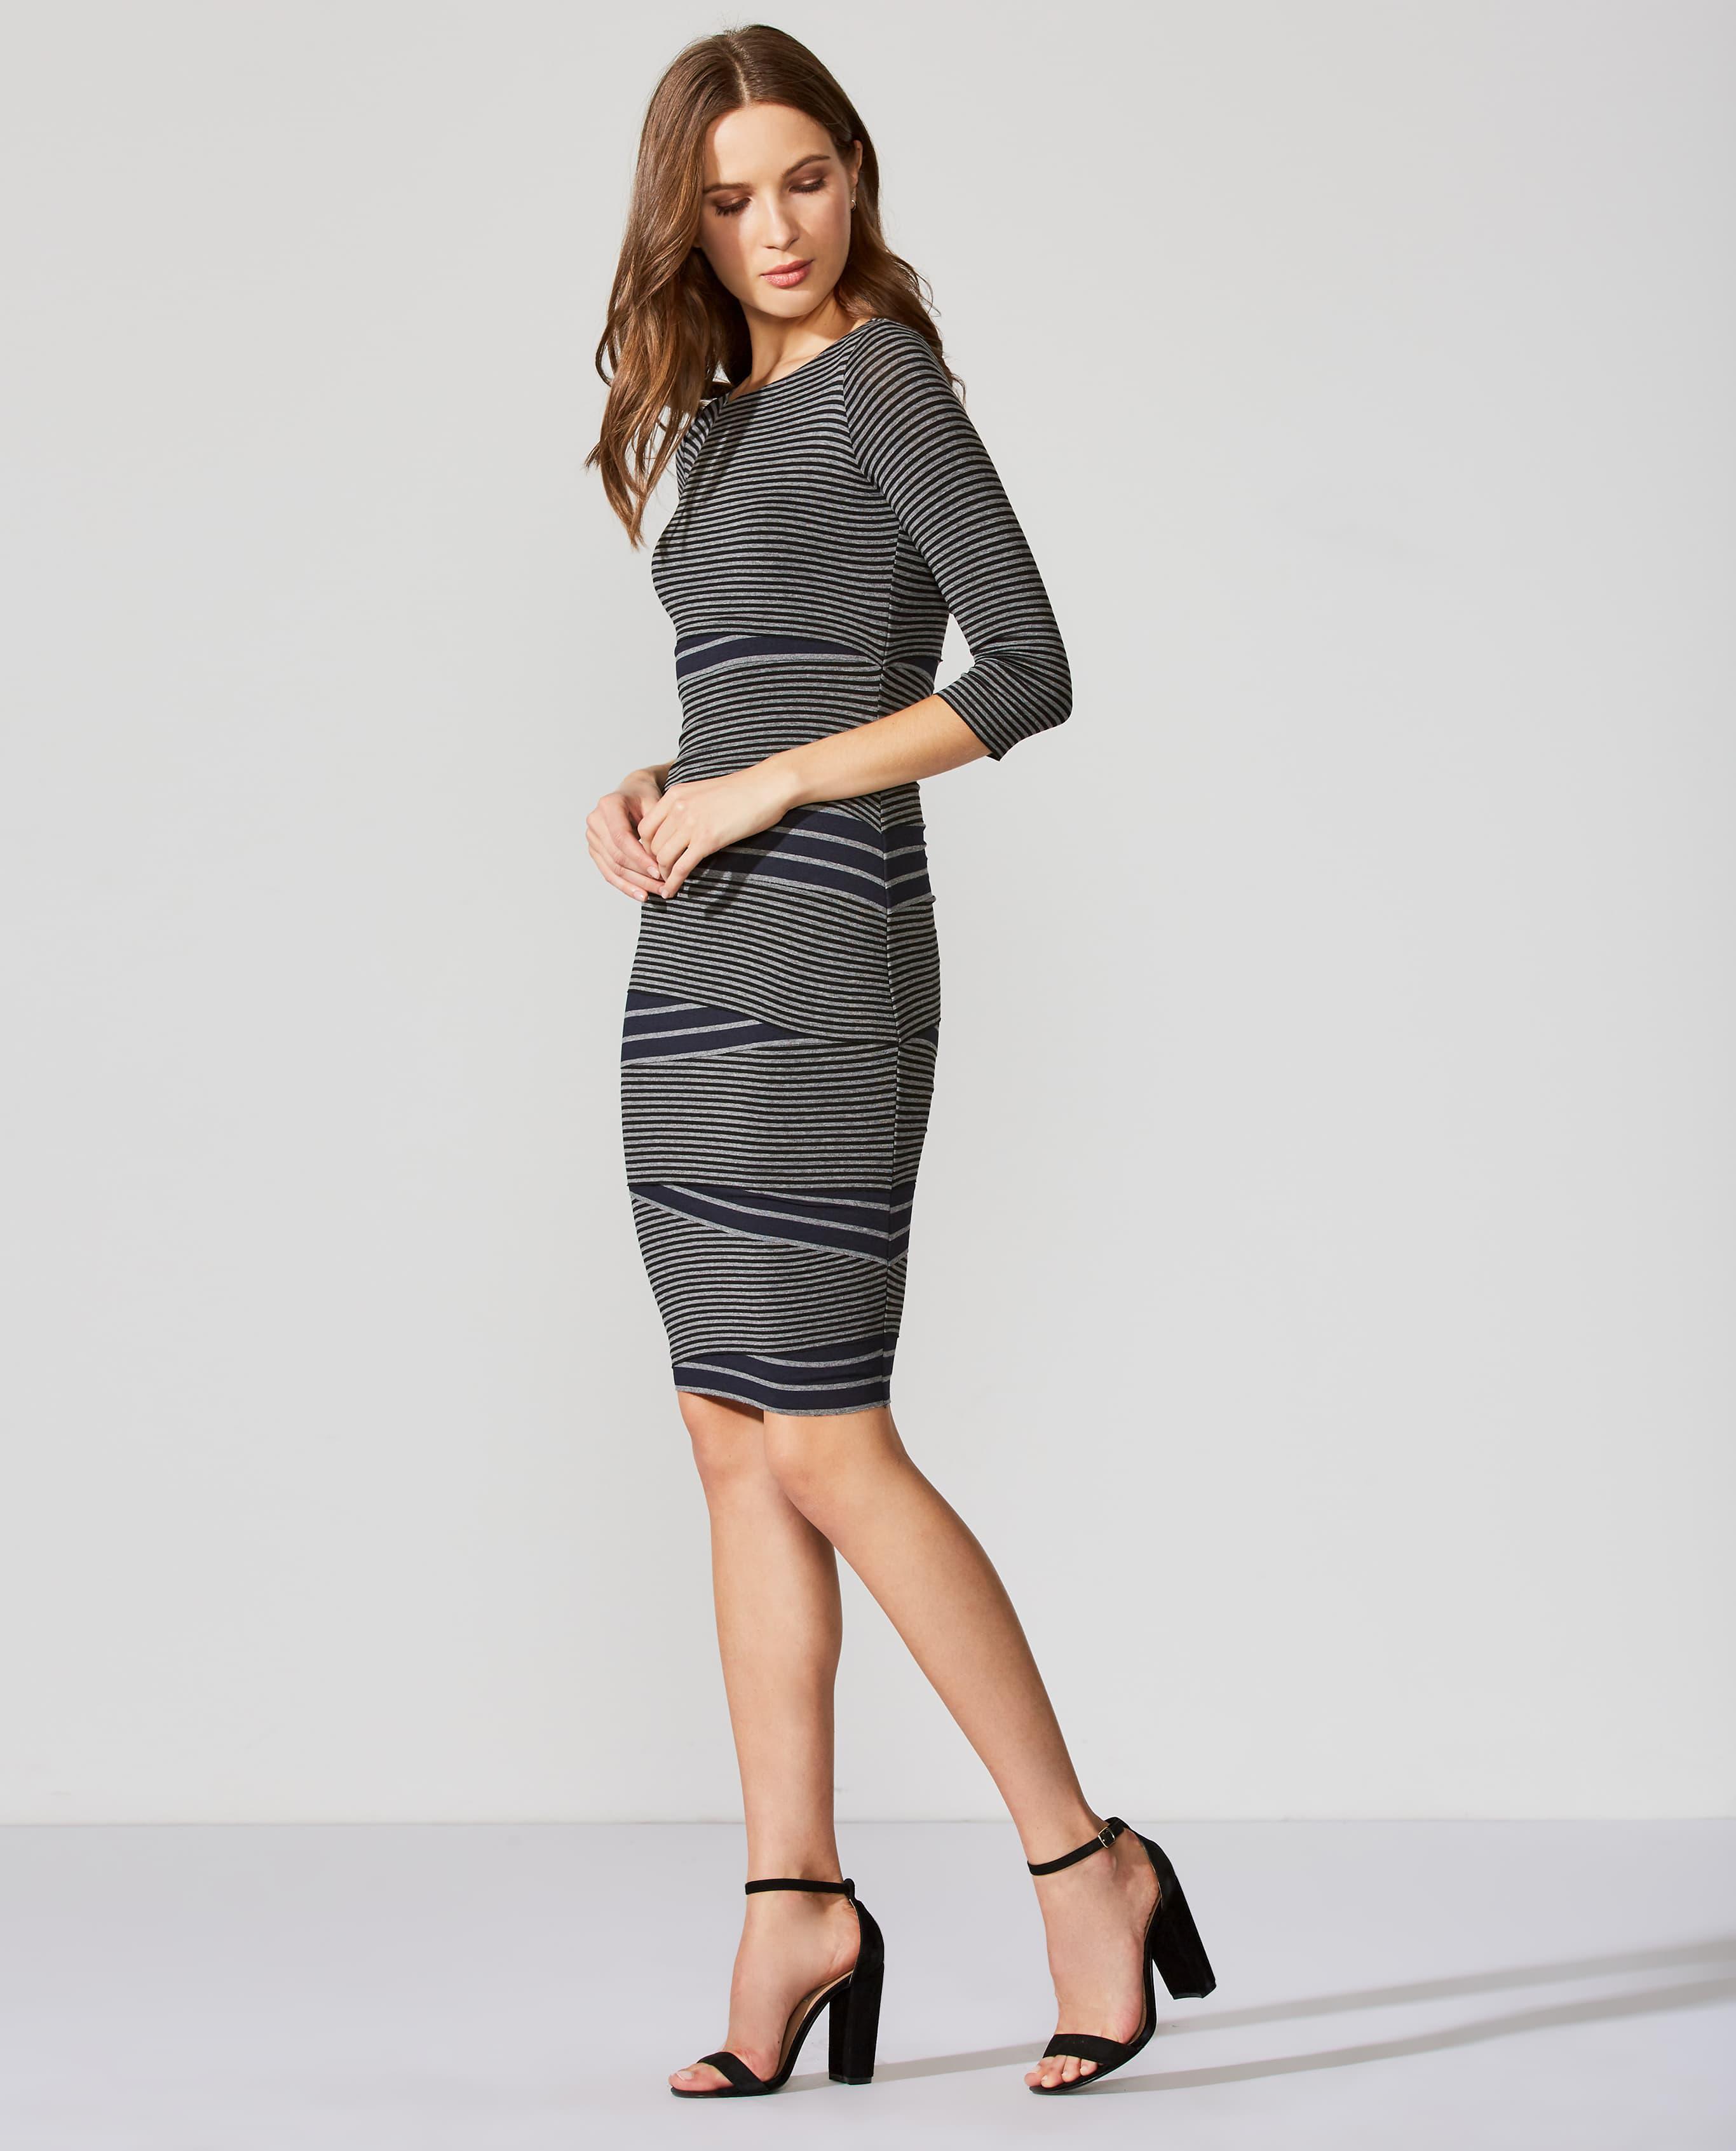 Bailey Dress 44 In Arcade Black Lyst sQhrdt